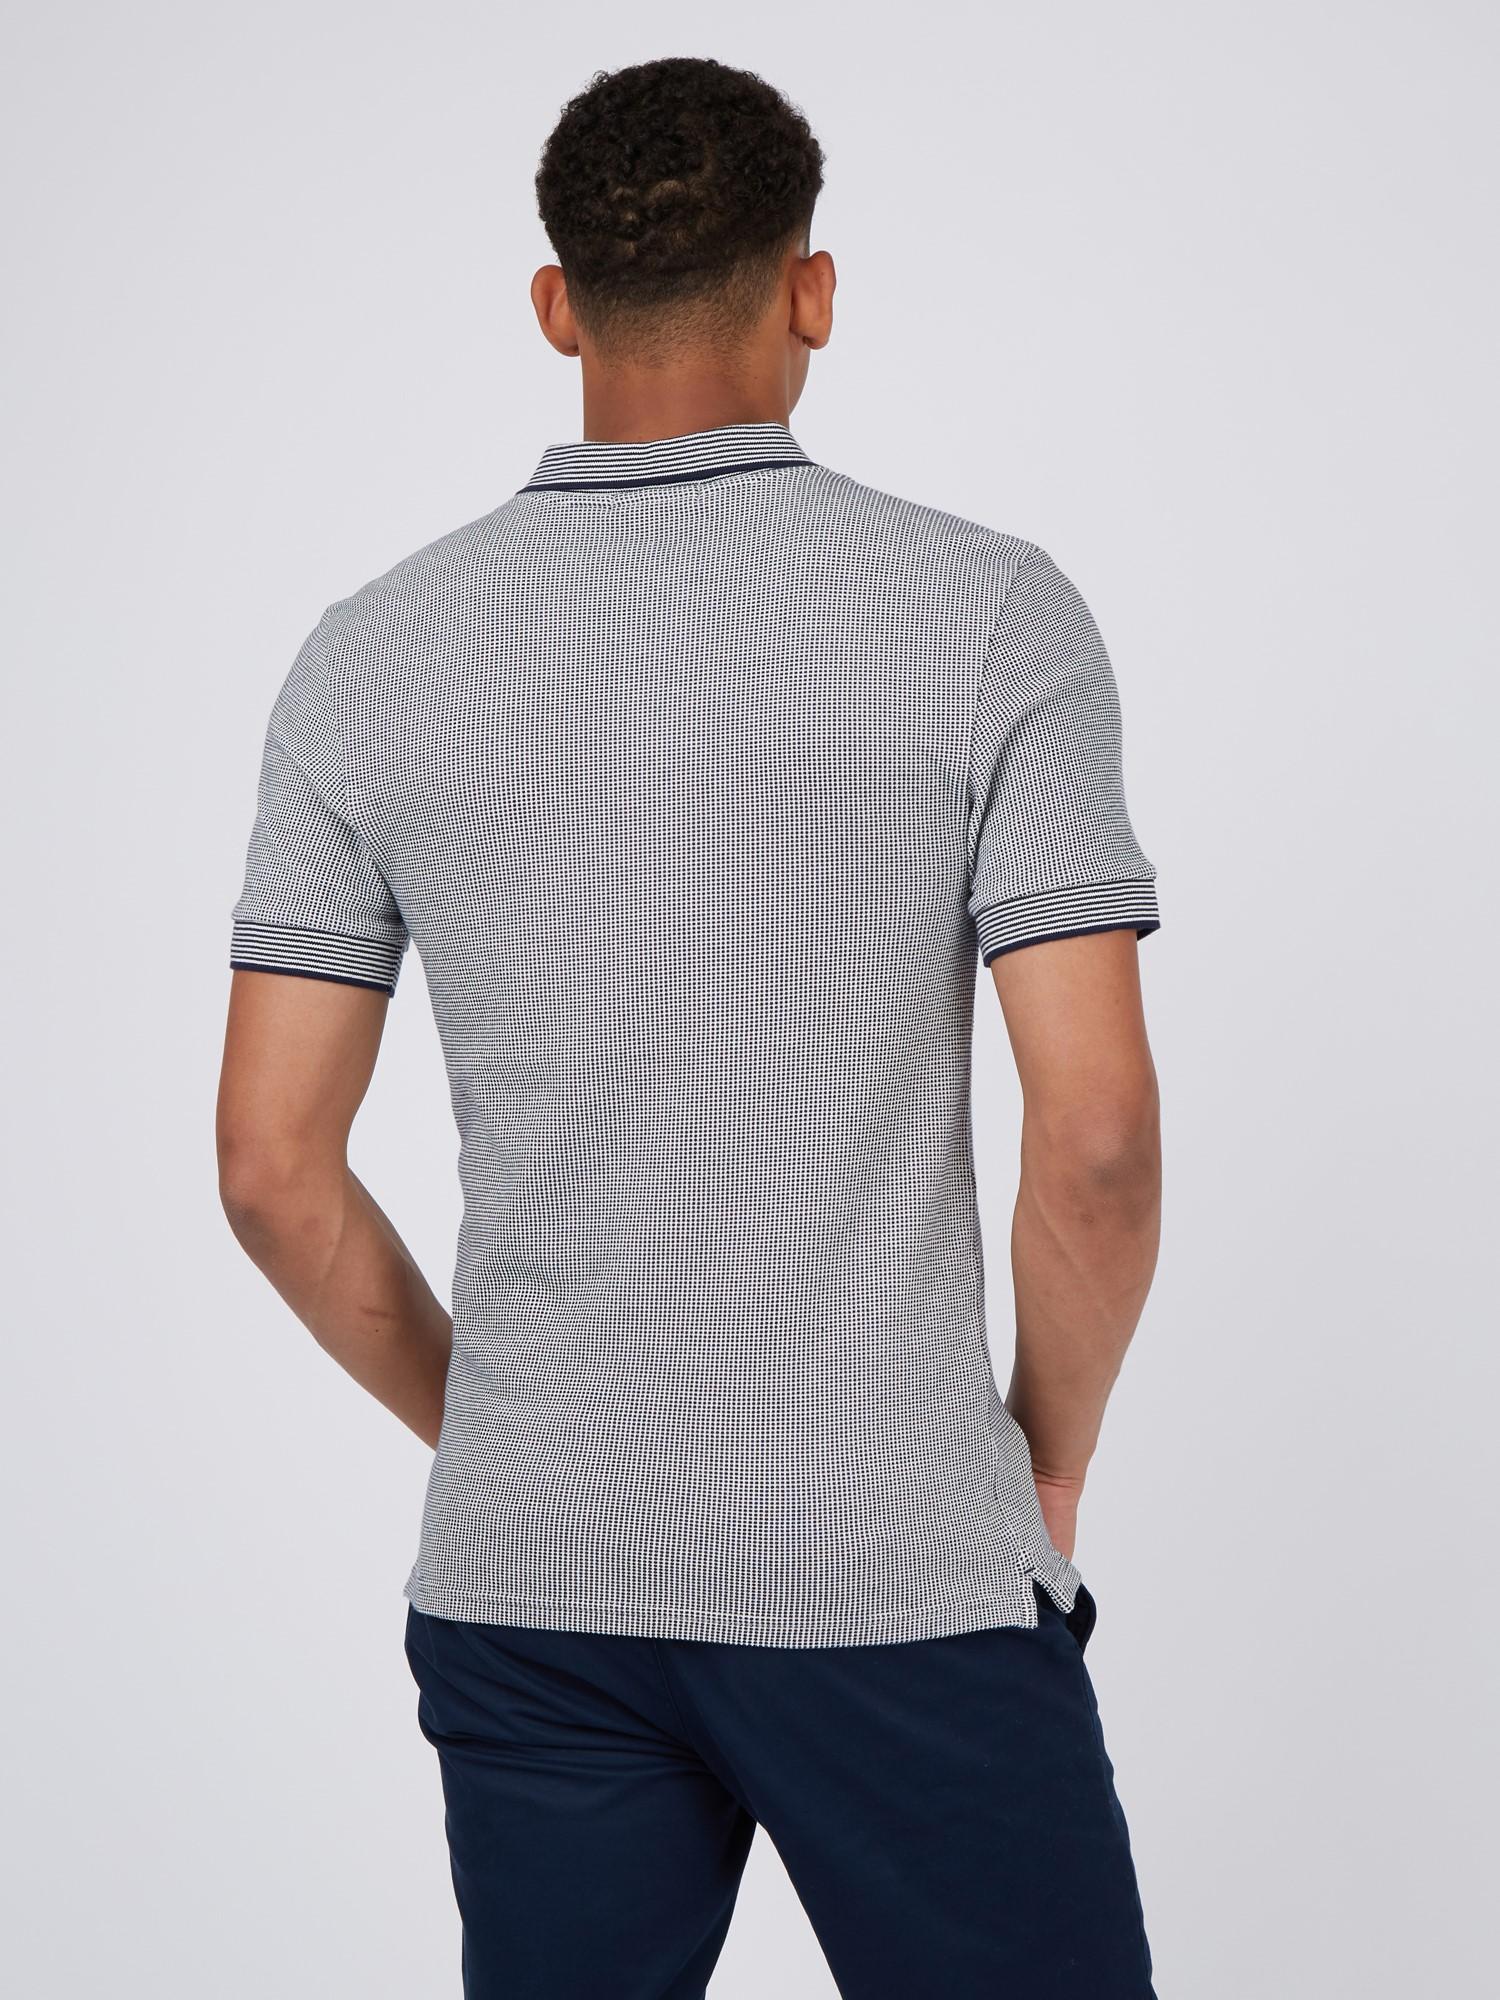 Marine Jacquard Polo Shirt